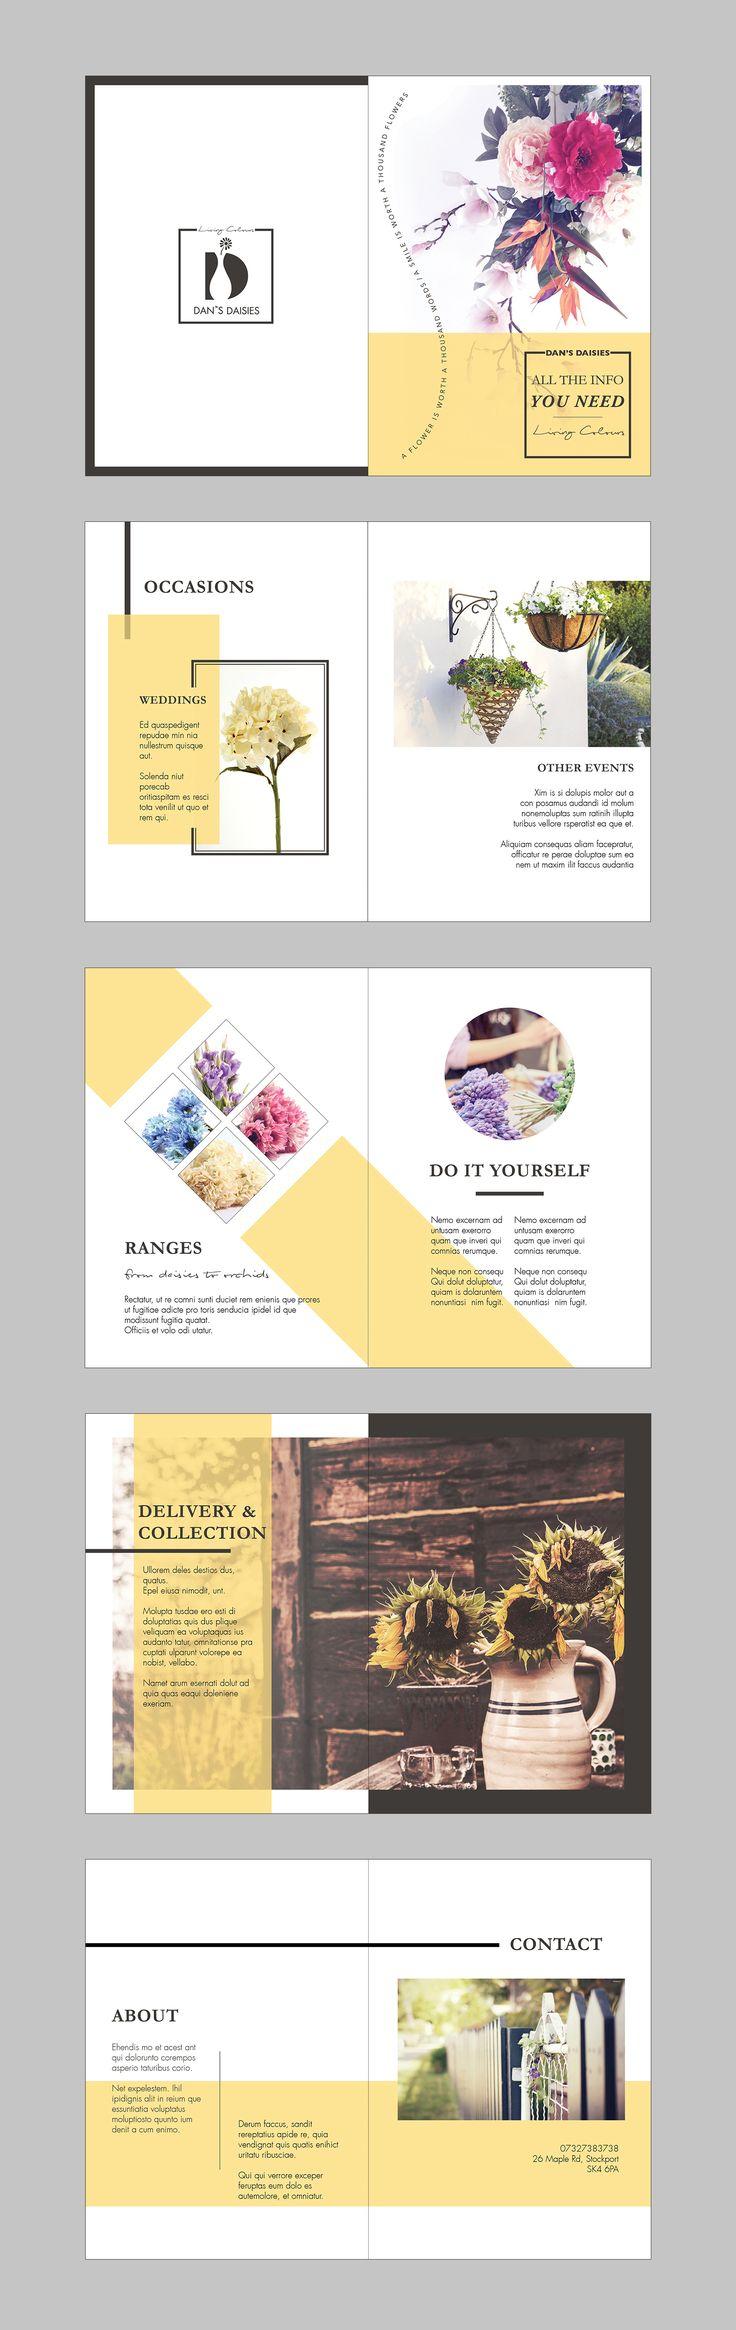 10 best scar ruiz images on pinterest stems cake and fruit flan dans daisies brochure designed by miya levy graphic design brochure design solutioingenieria Images